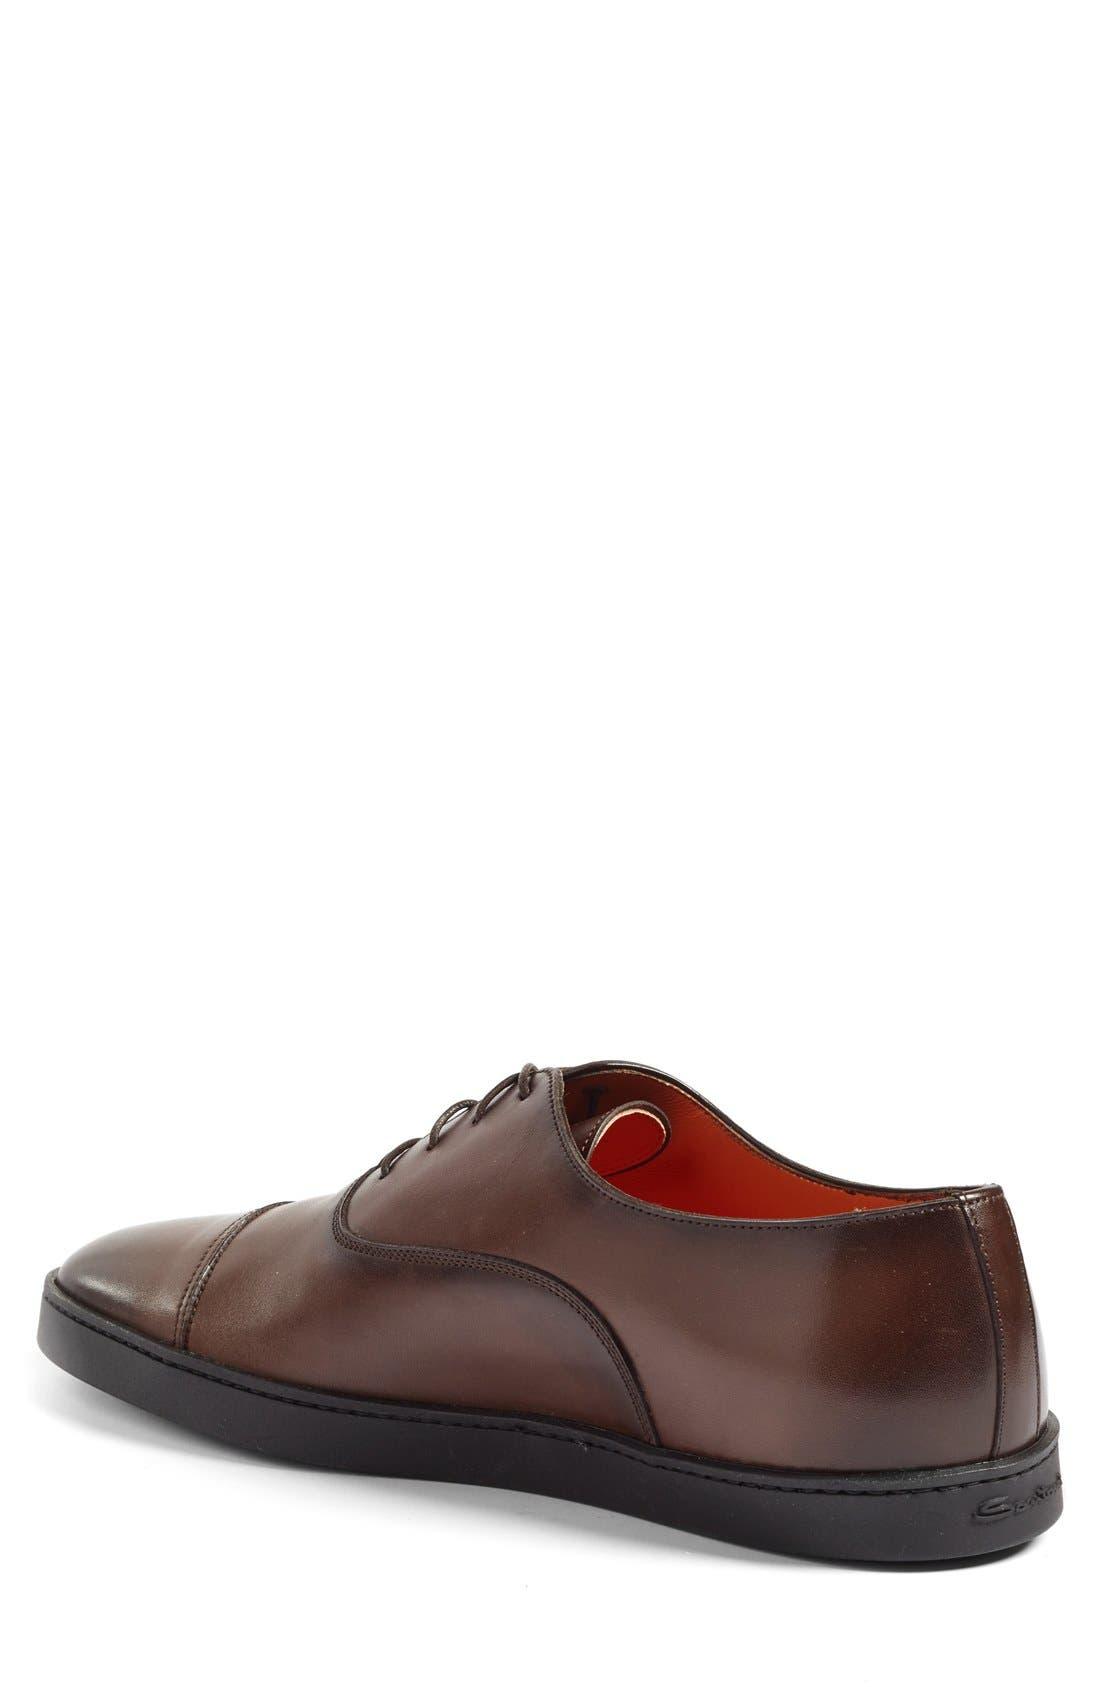 'Durbin' Oxford Sneaker,                             Alternate thumbnail 2, color,                             209